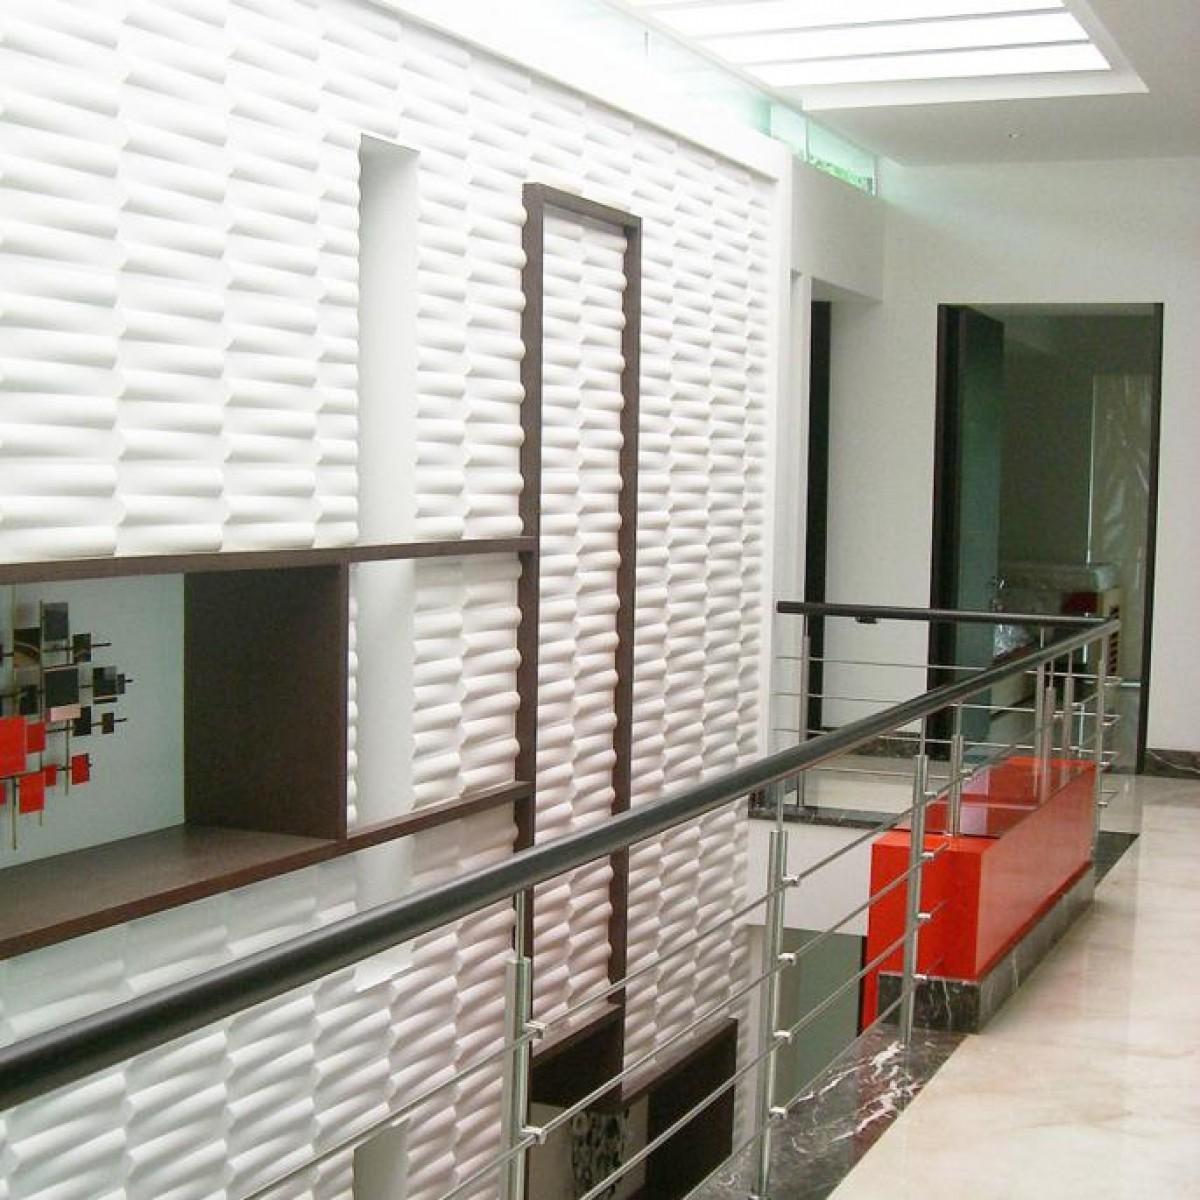 Box Wall Panels : Seesaw pattern design d glue on wall panel flats